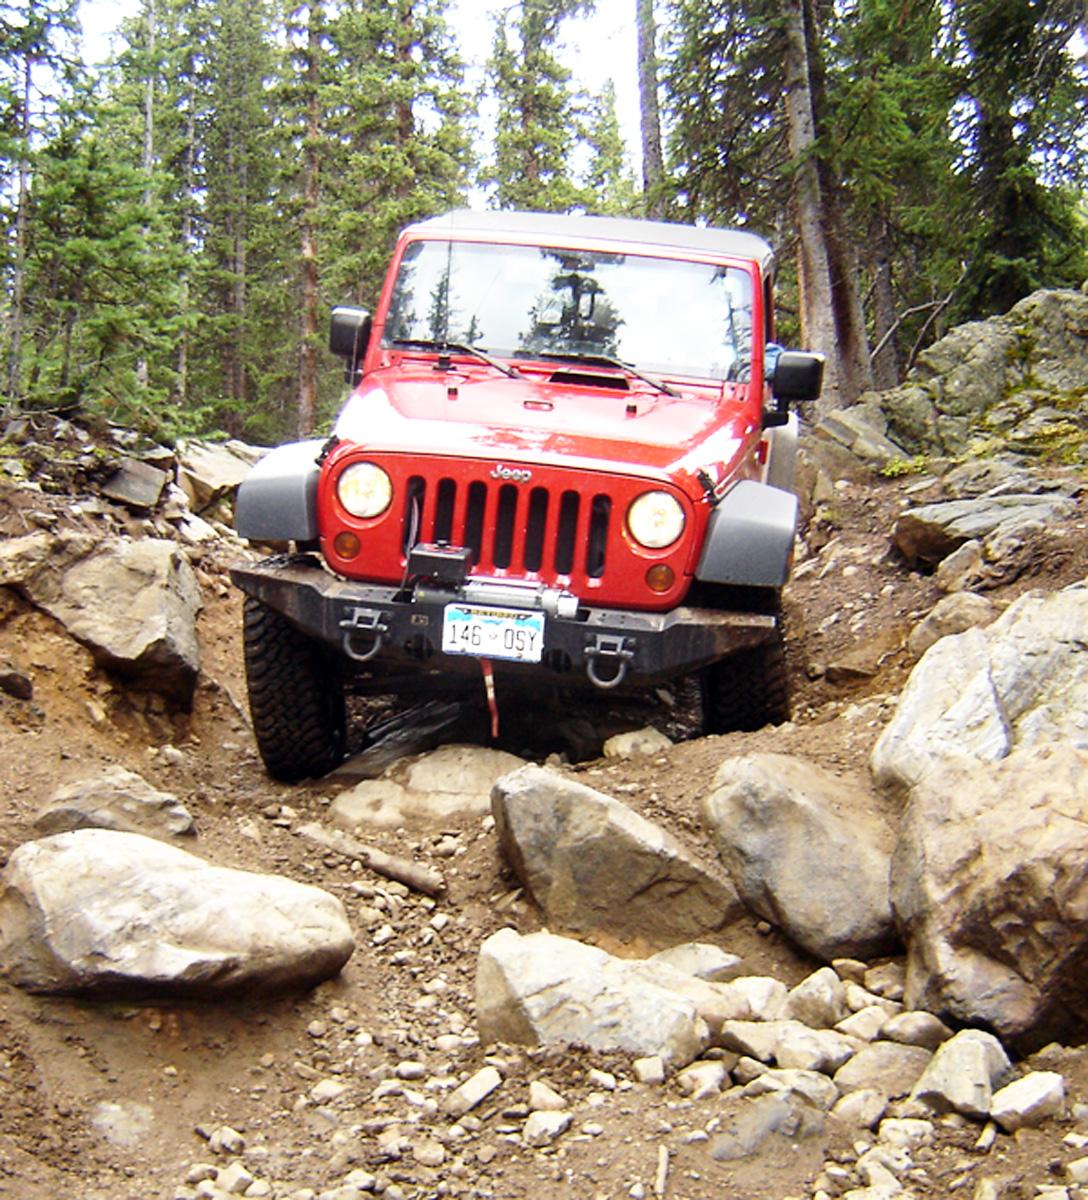 Georgia_Pass_2009_006a.jpg